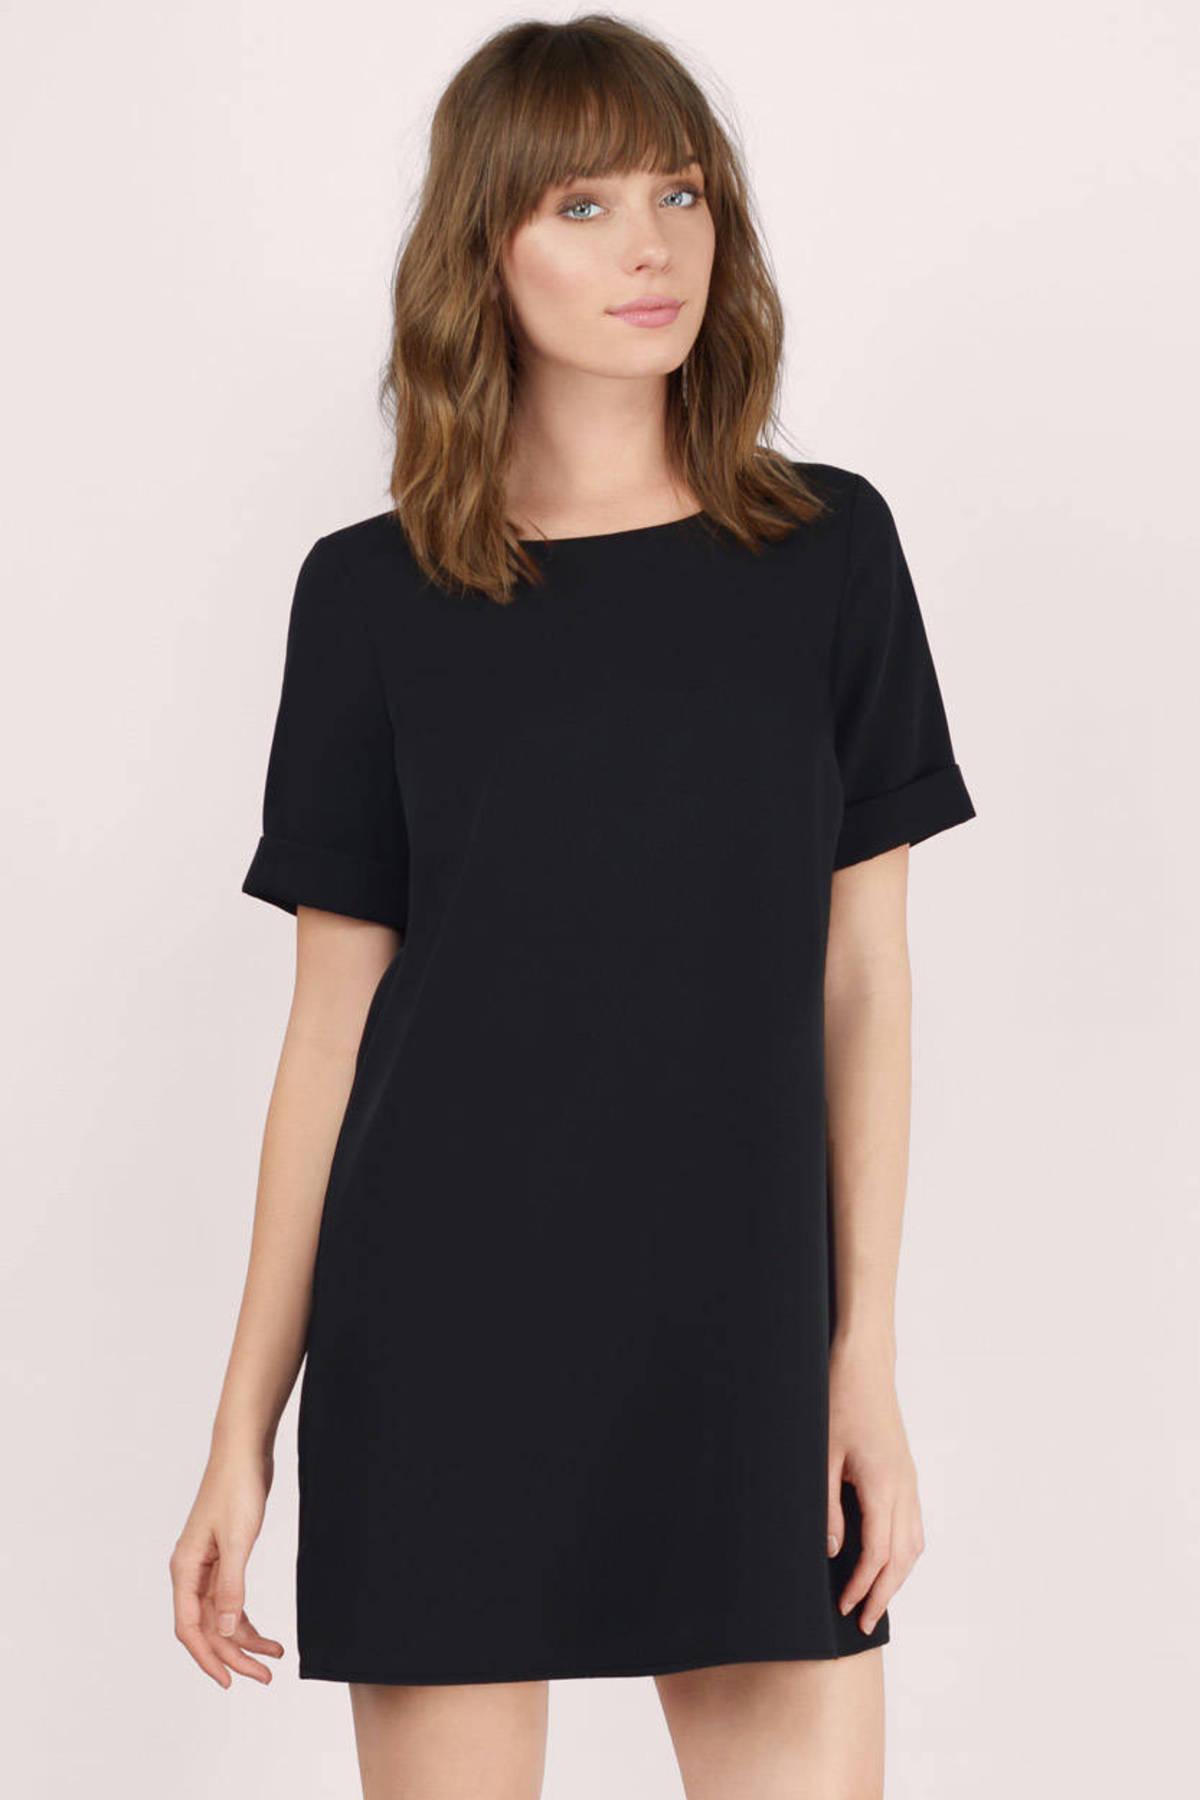 Black Shift Dress - Black Dress - Short Sleeve Dress - $23.00